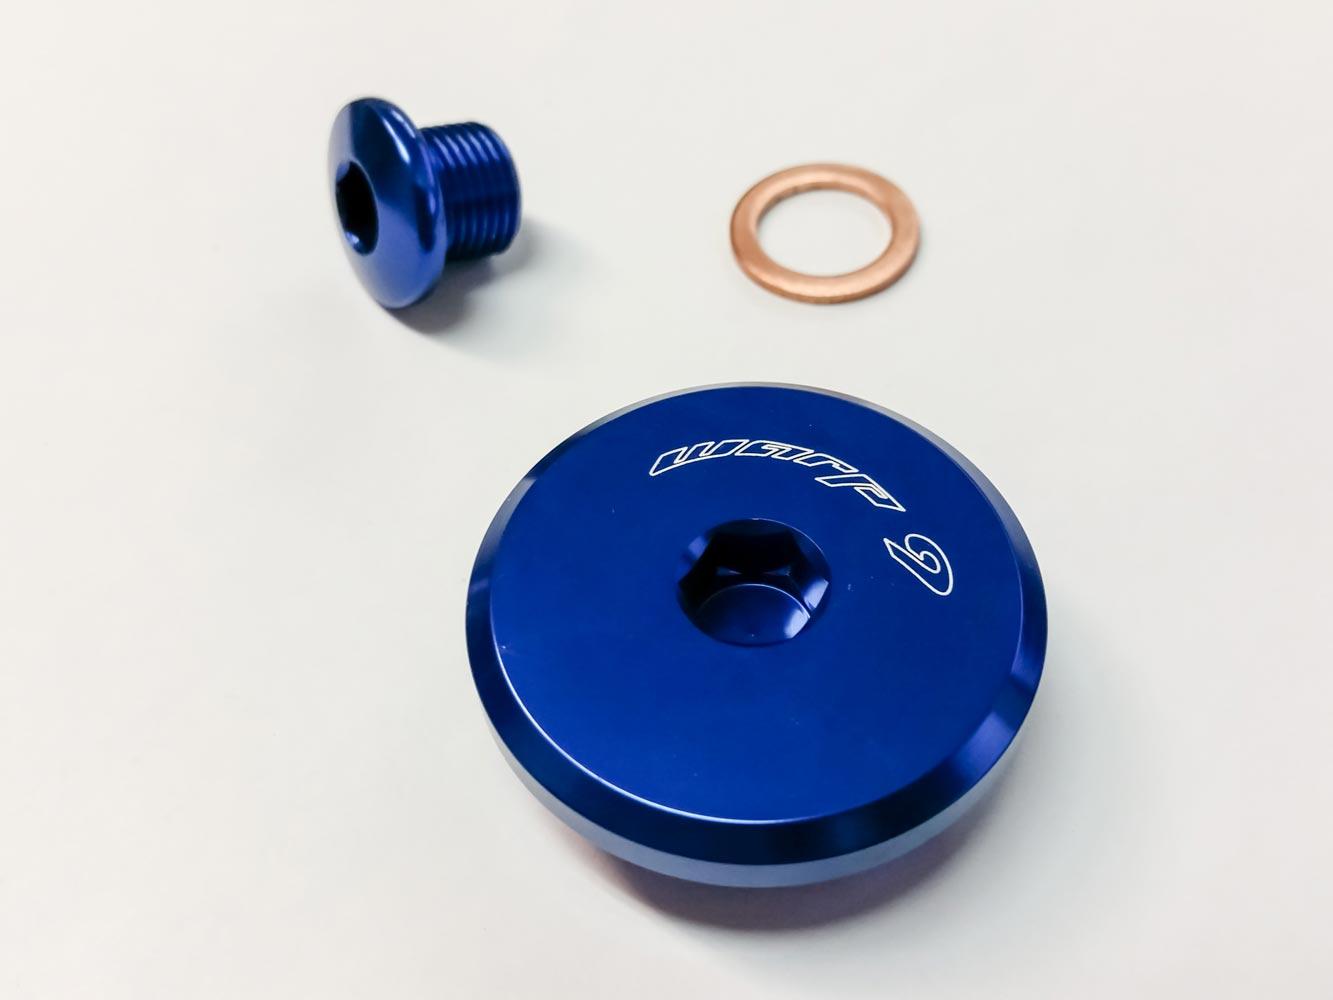 Engine Plug - Warp 9 Racing